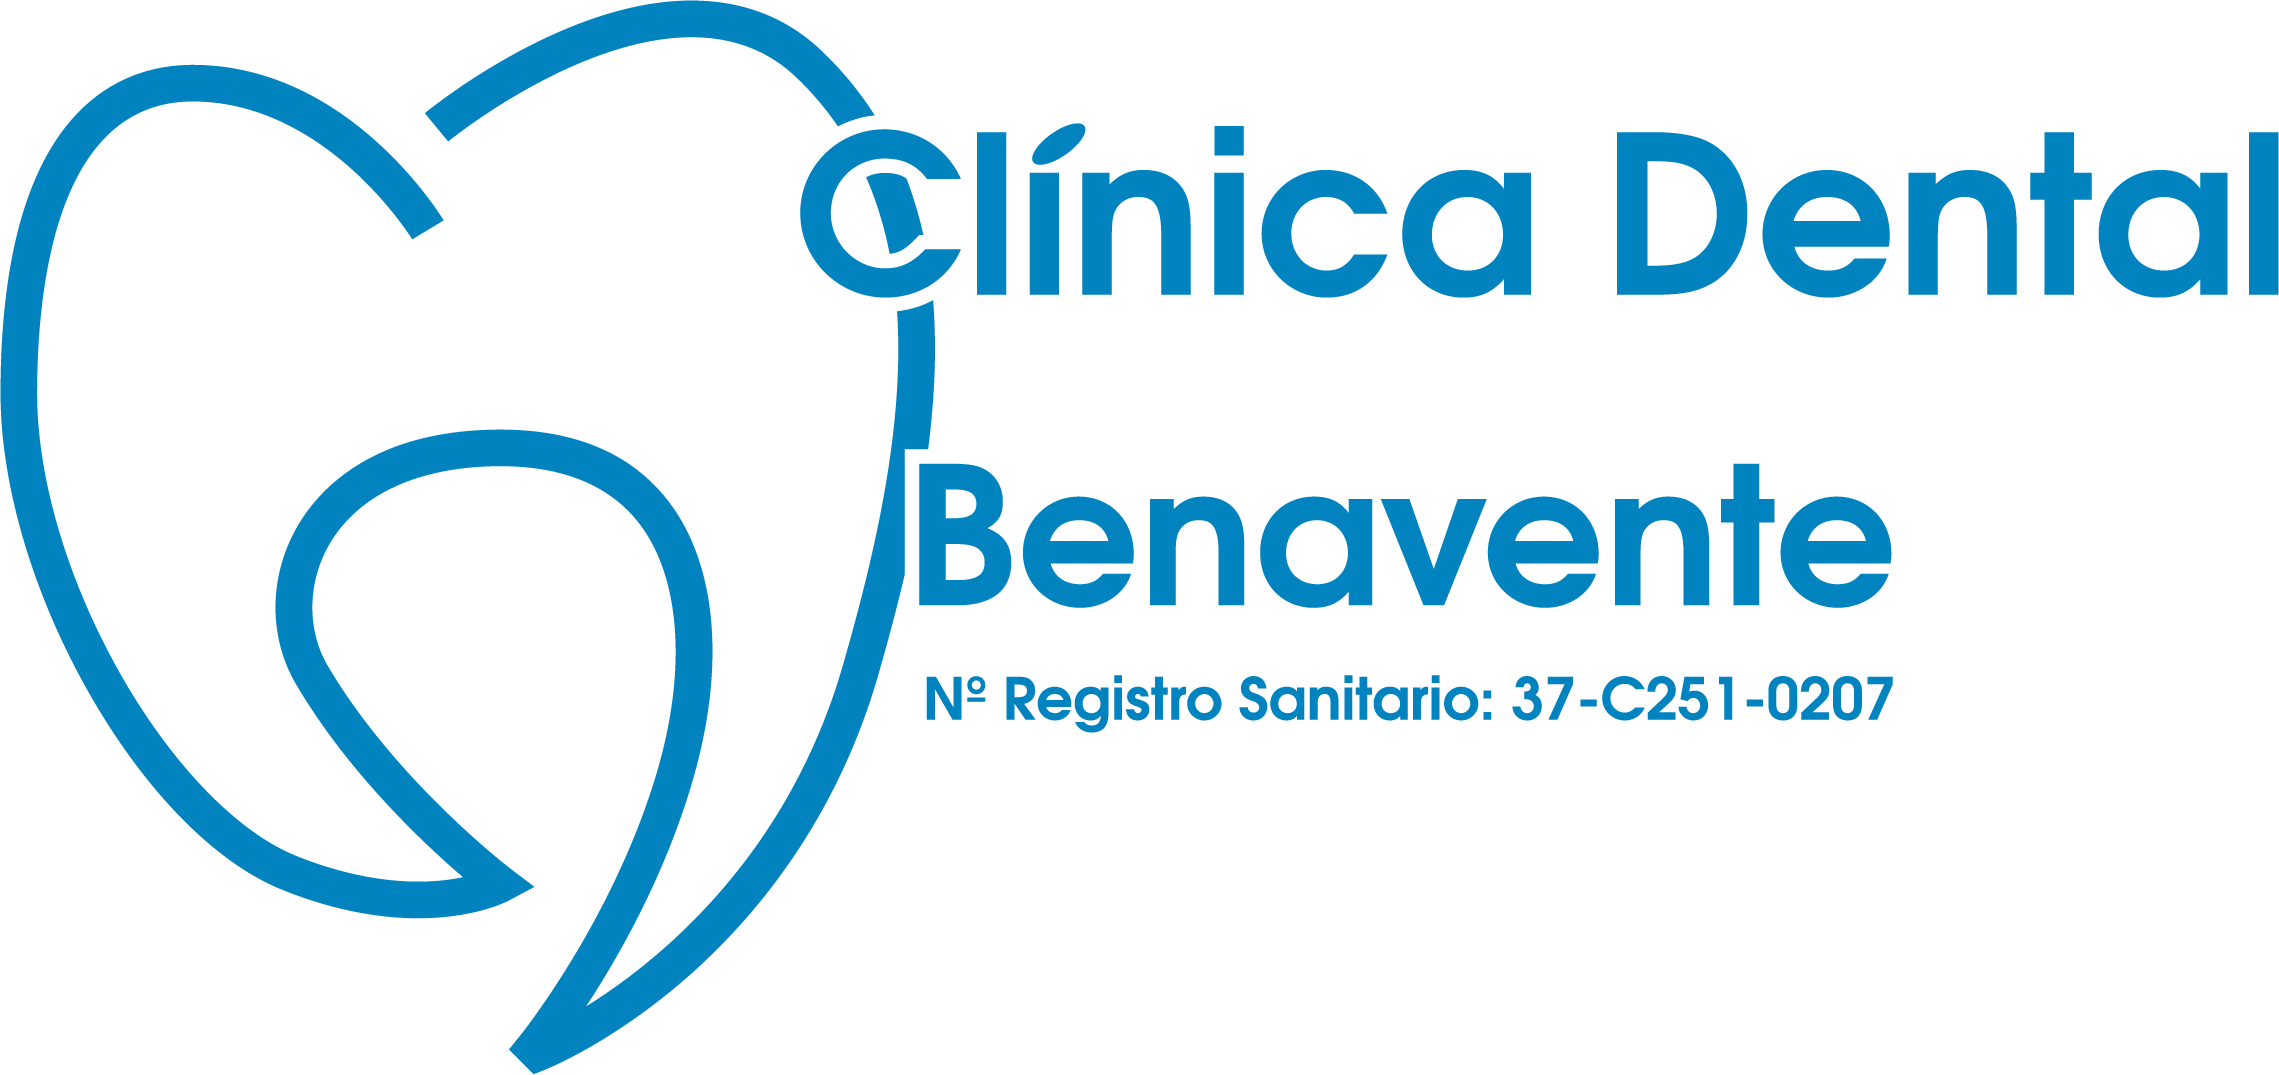 Dental Benavente